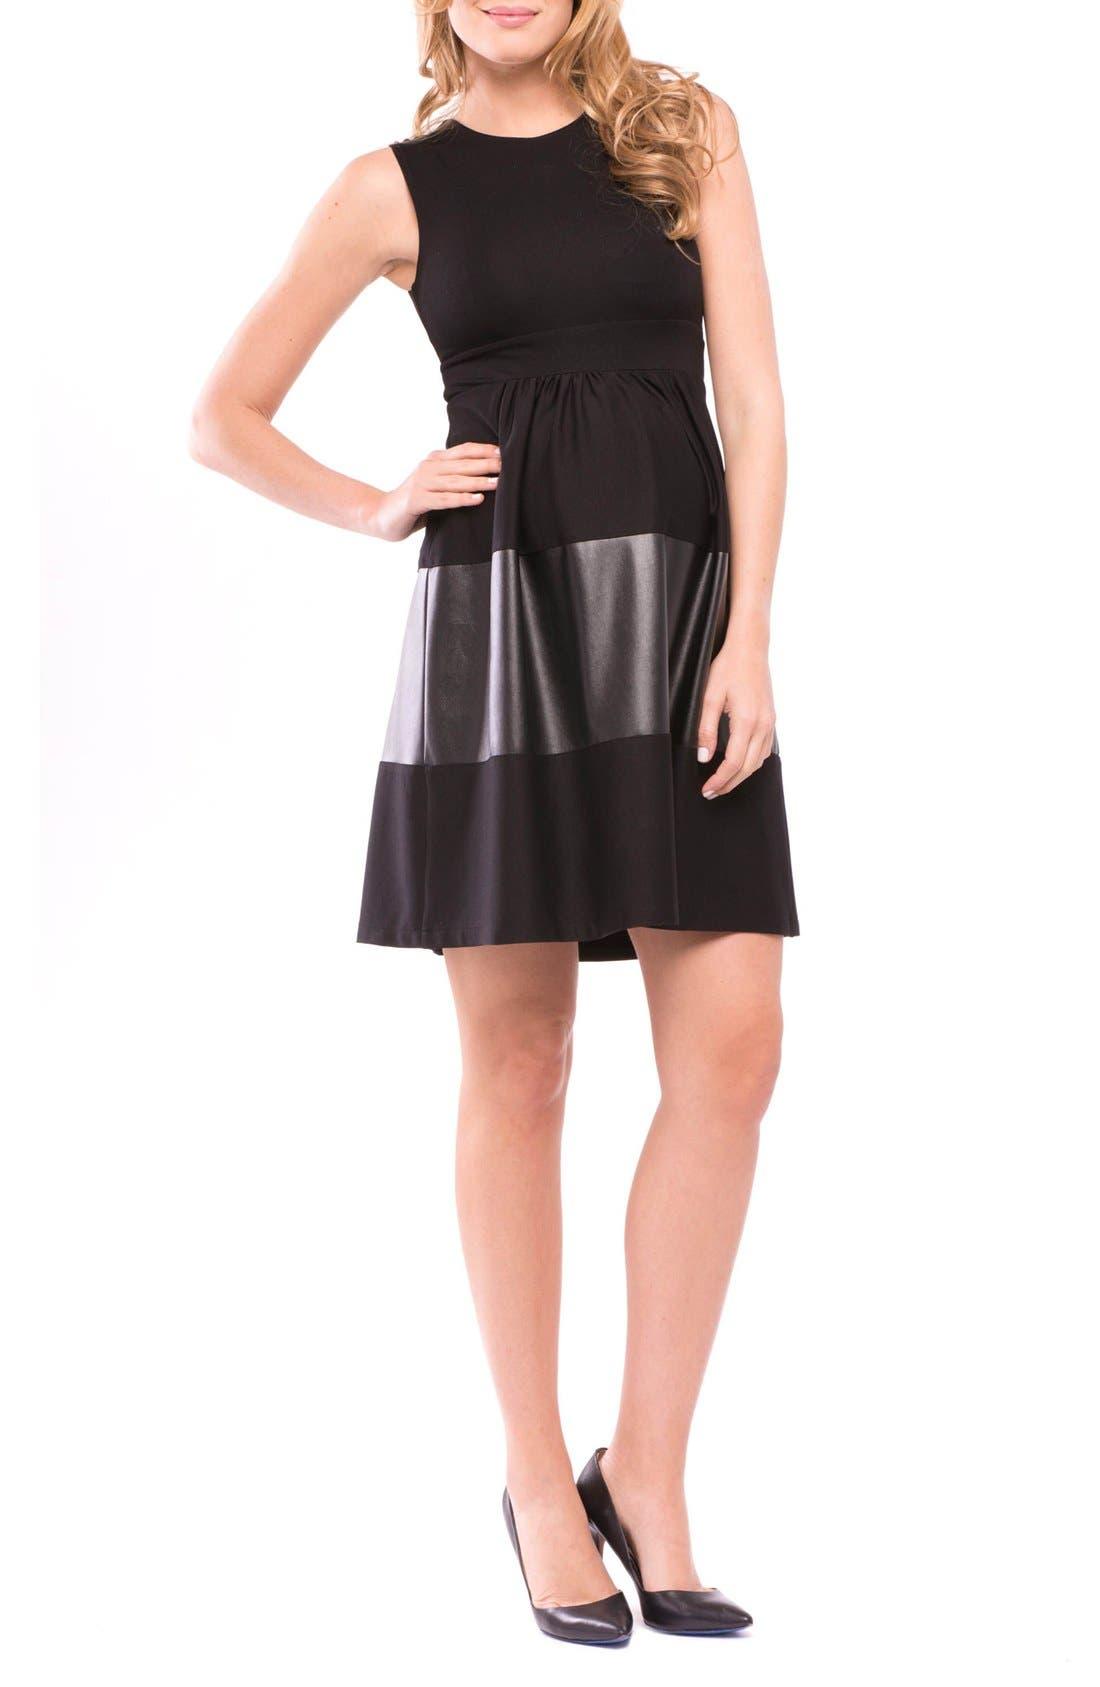 OLIAN Melissa Sleeveless Fit & Flare Maternity Dress